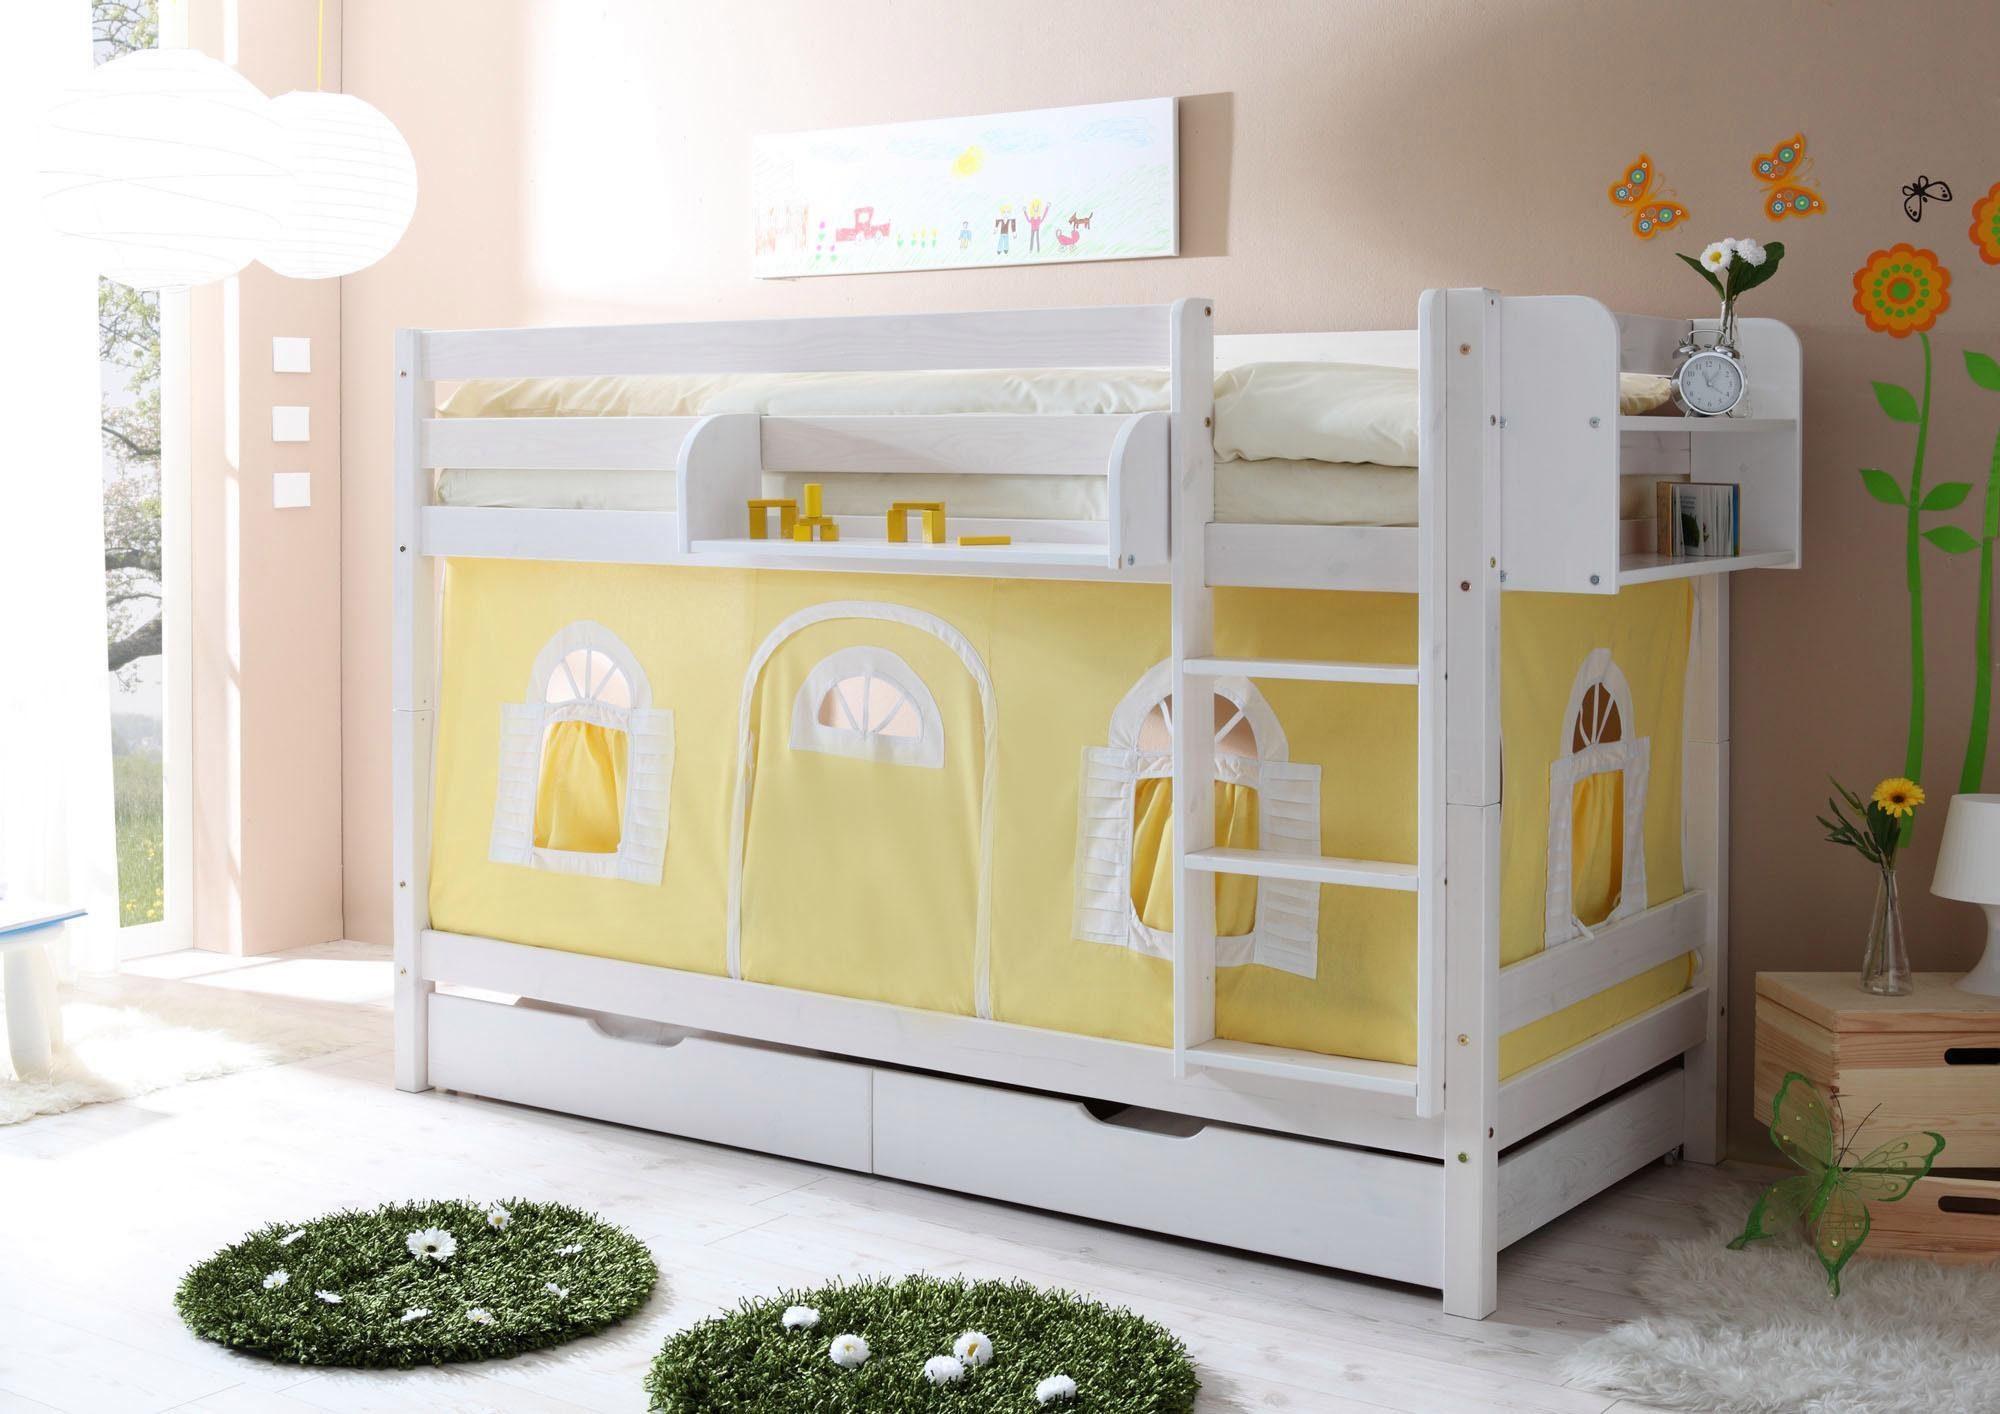 Etagenbett Weiß Massiv : Relita etagenbett mike in buche massiv weiß lackiert inkl